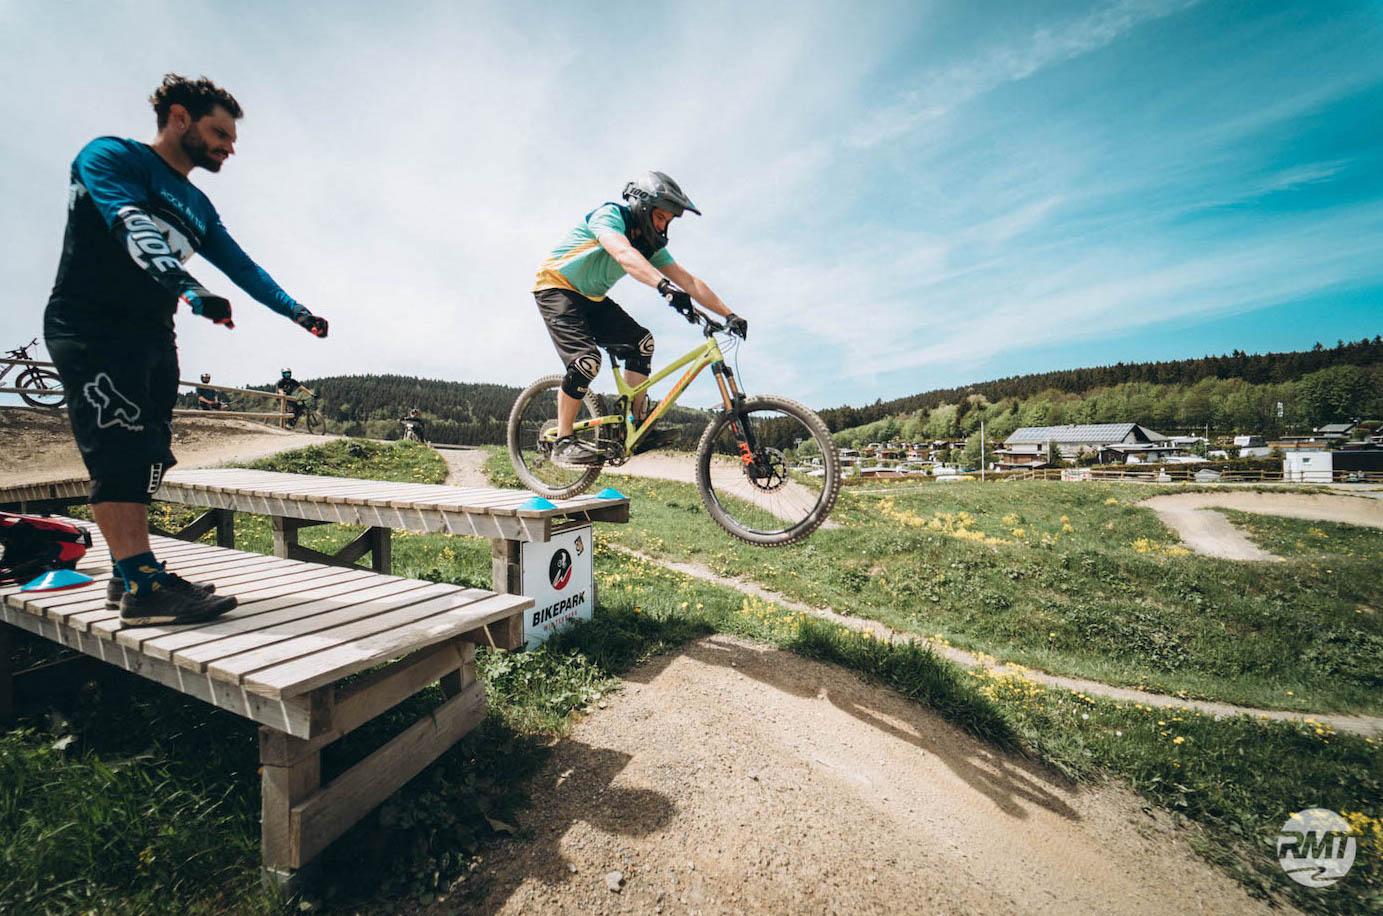 MTB Sprung & Drop Kurs im Trailpark Erbeskopf - Fahrtechnik Training Rock my Trail Bikeschule - 11